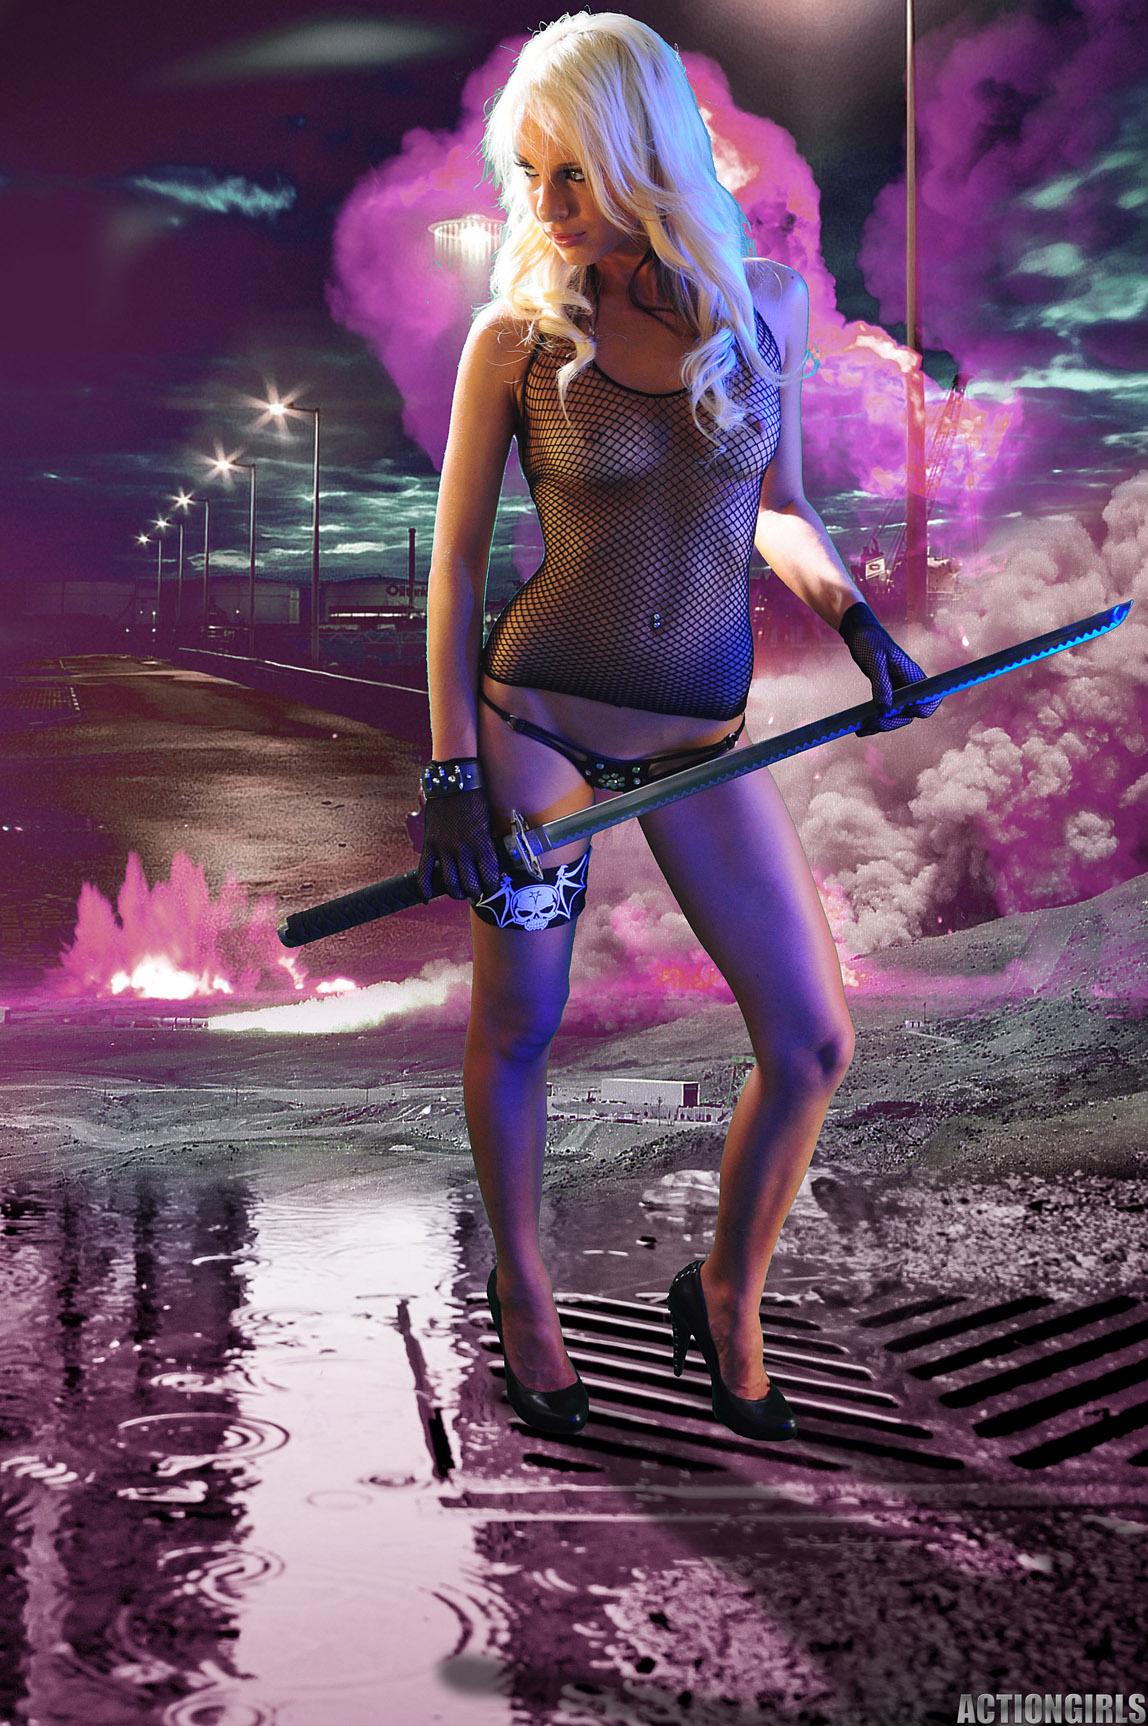 Denise-Girls-With-Swords